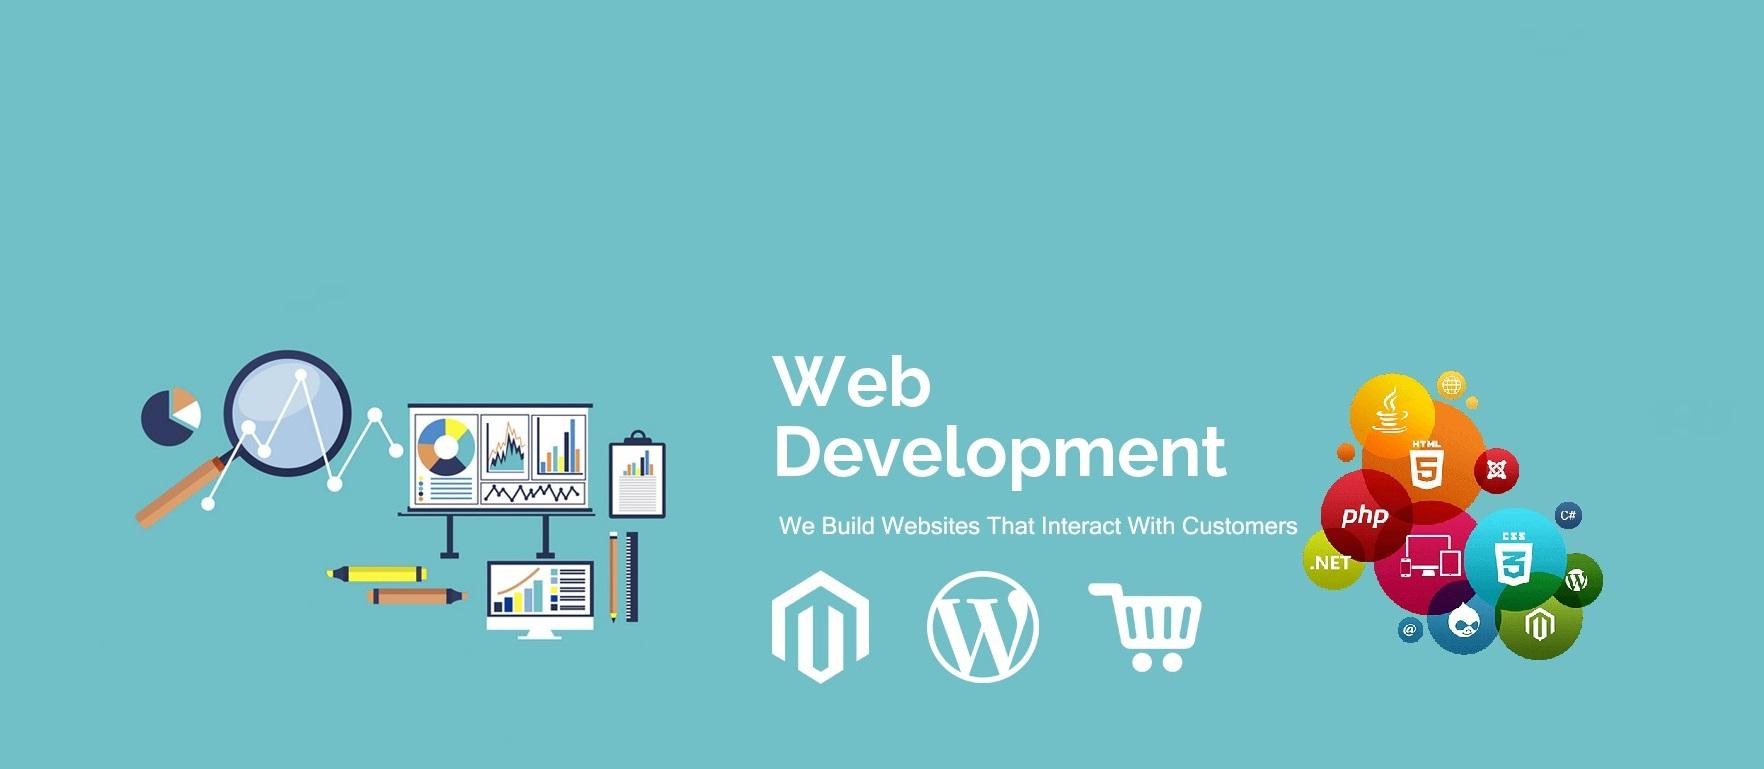 Web-development slider